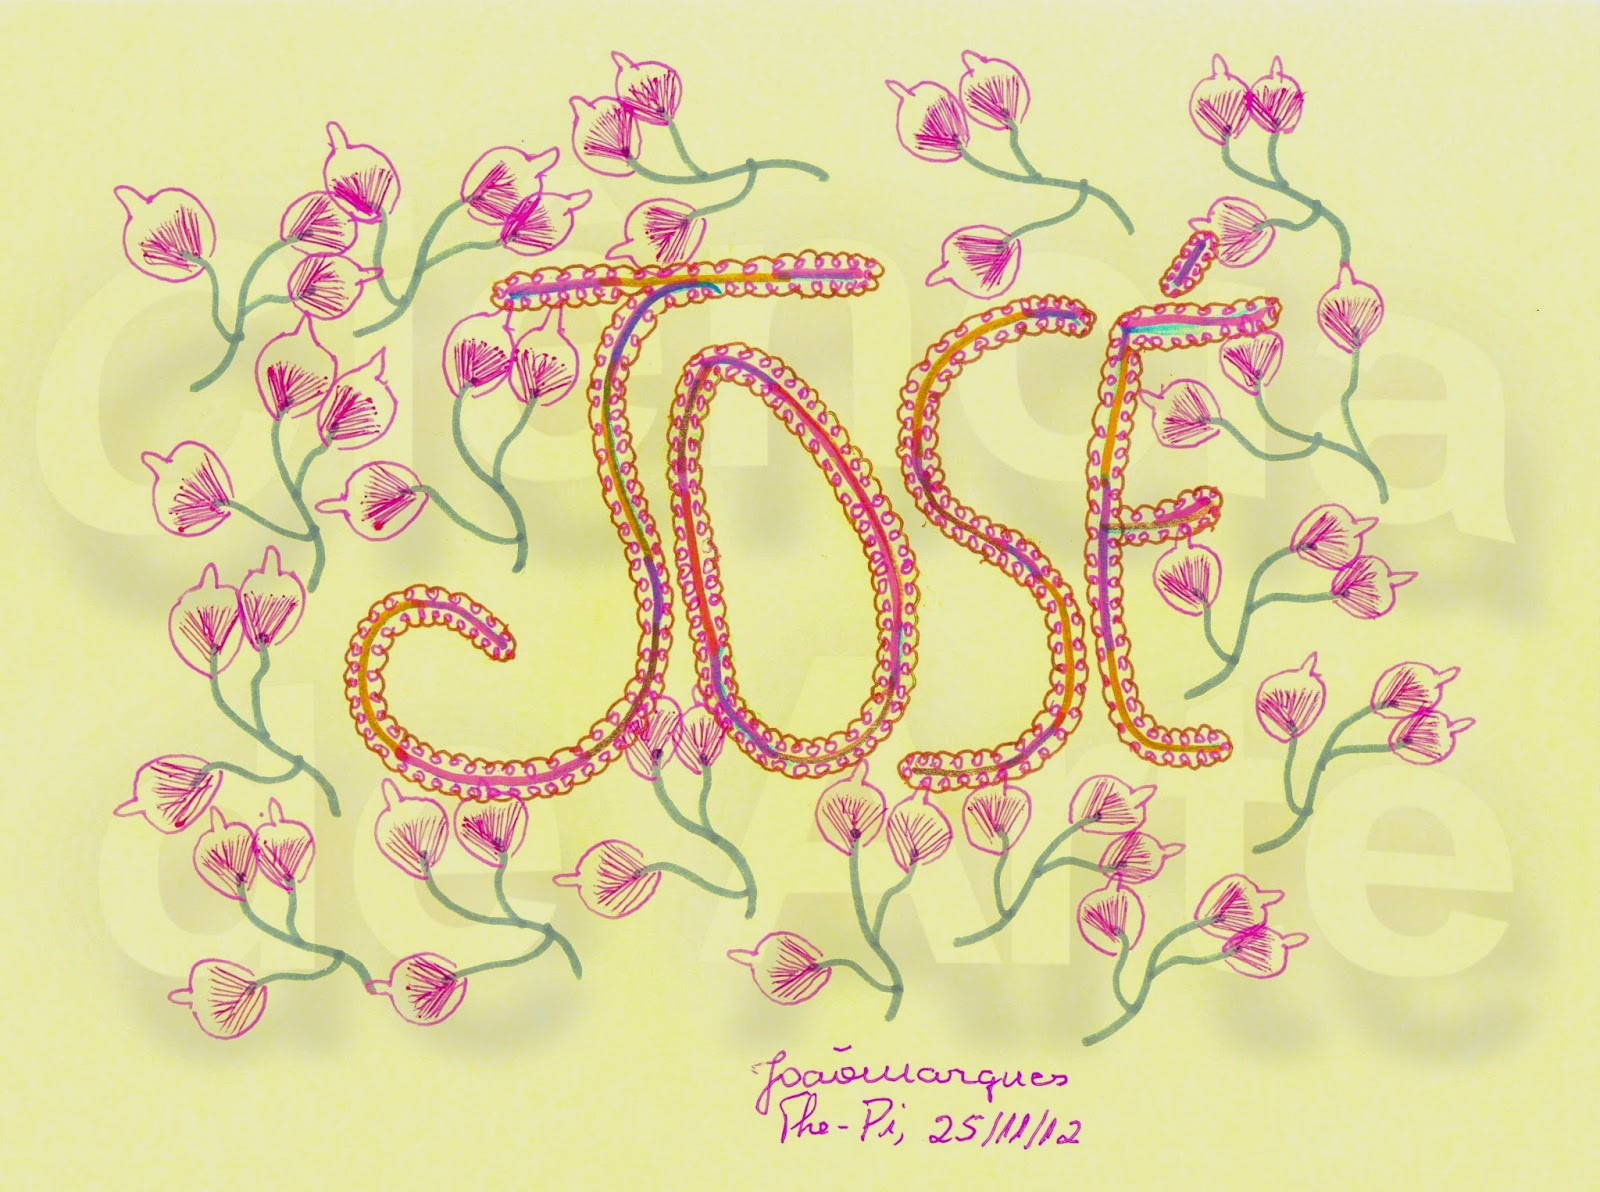 Nomes desenhados para perfil: José